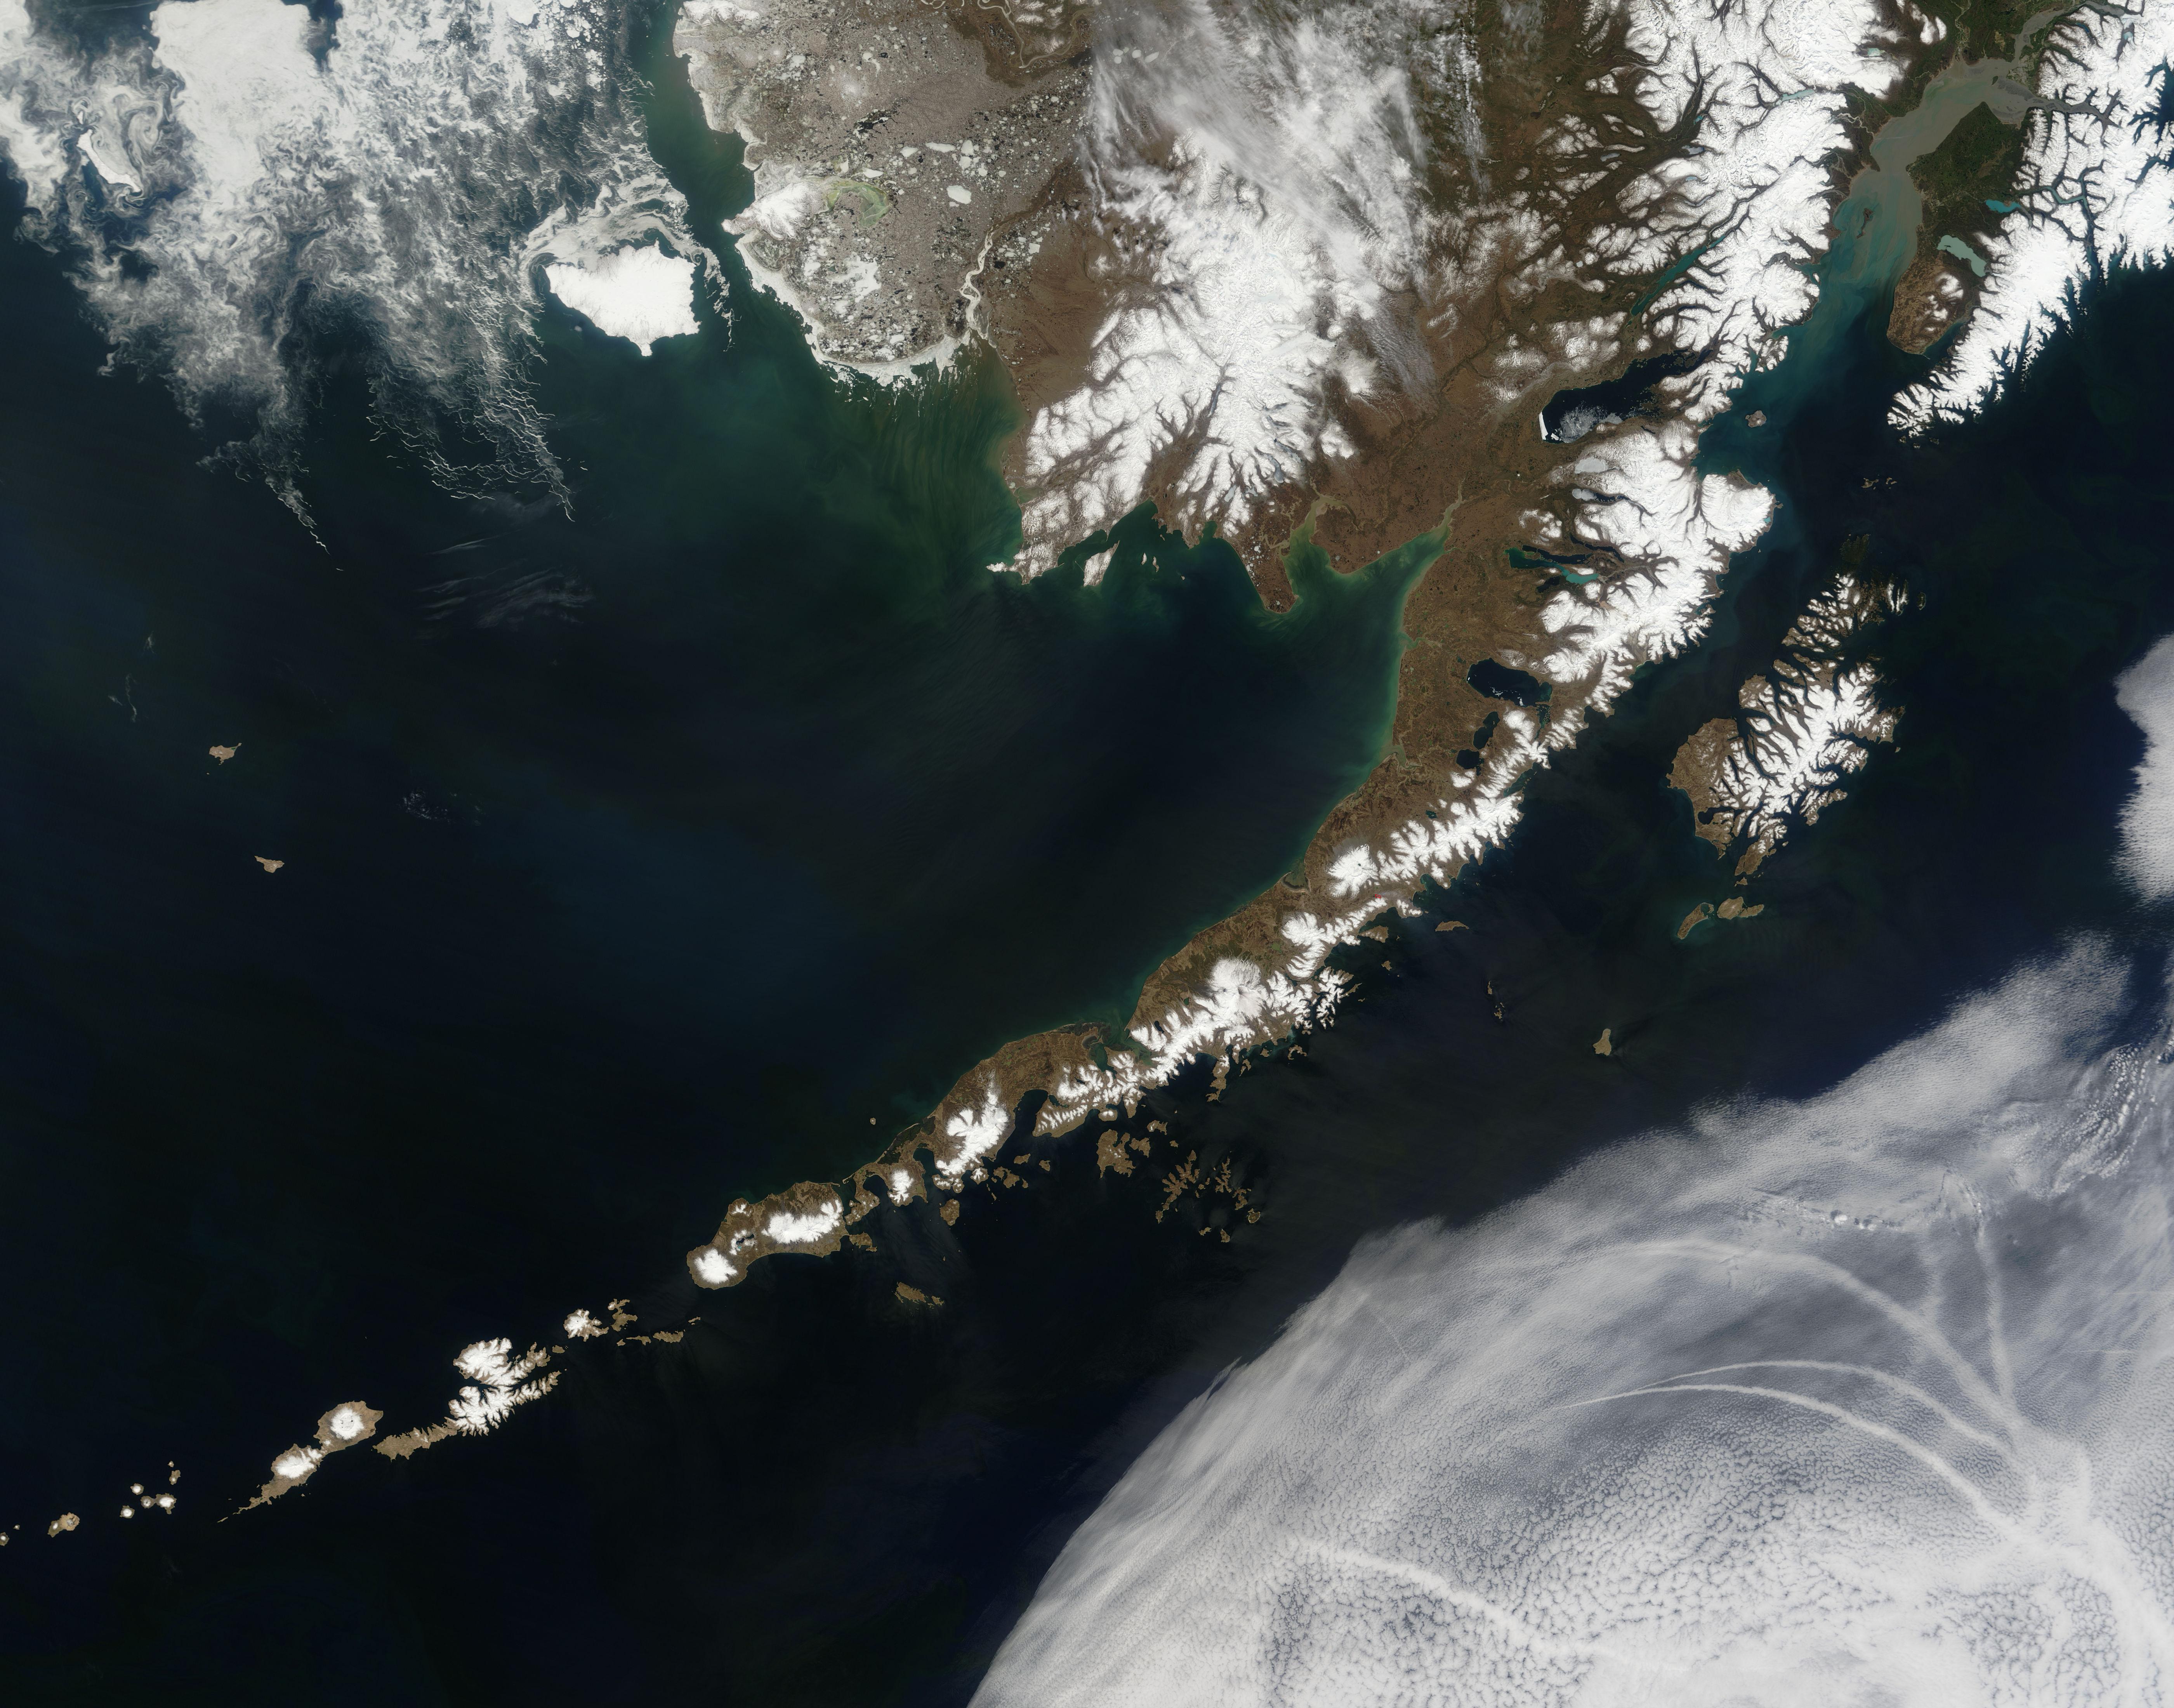 alaskas vulkaninseln die aleuten